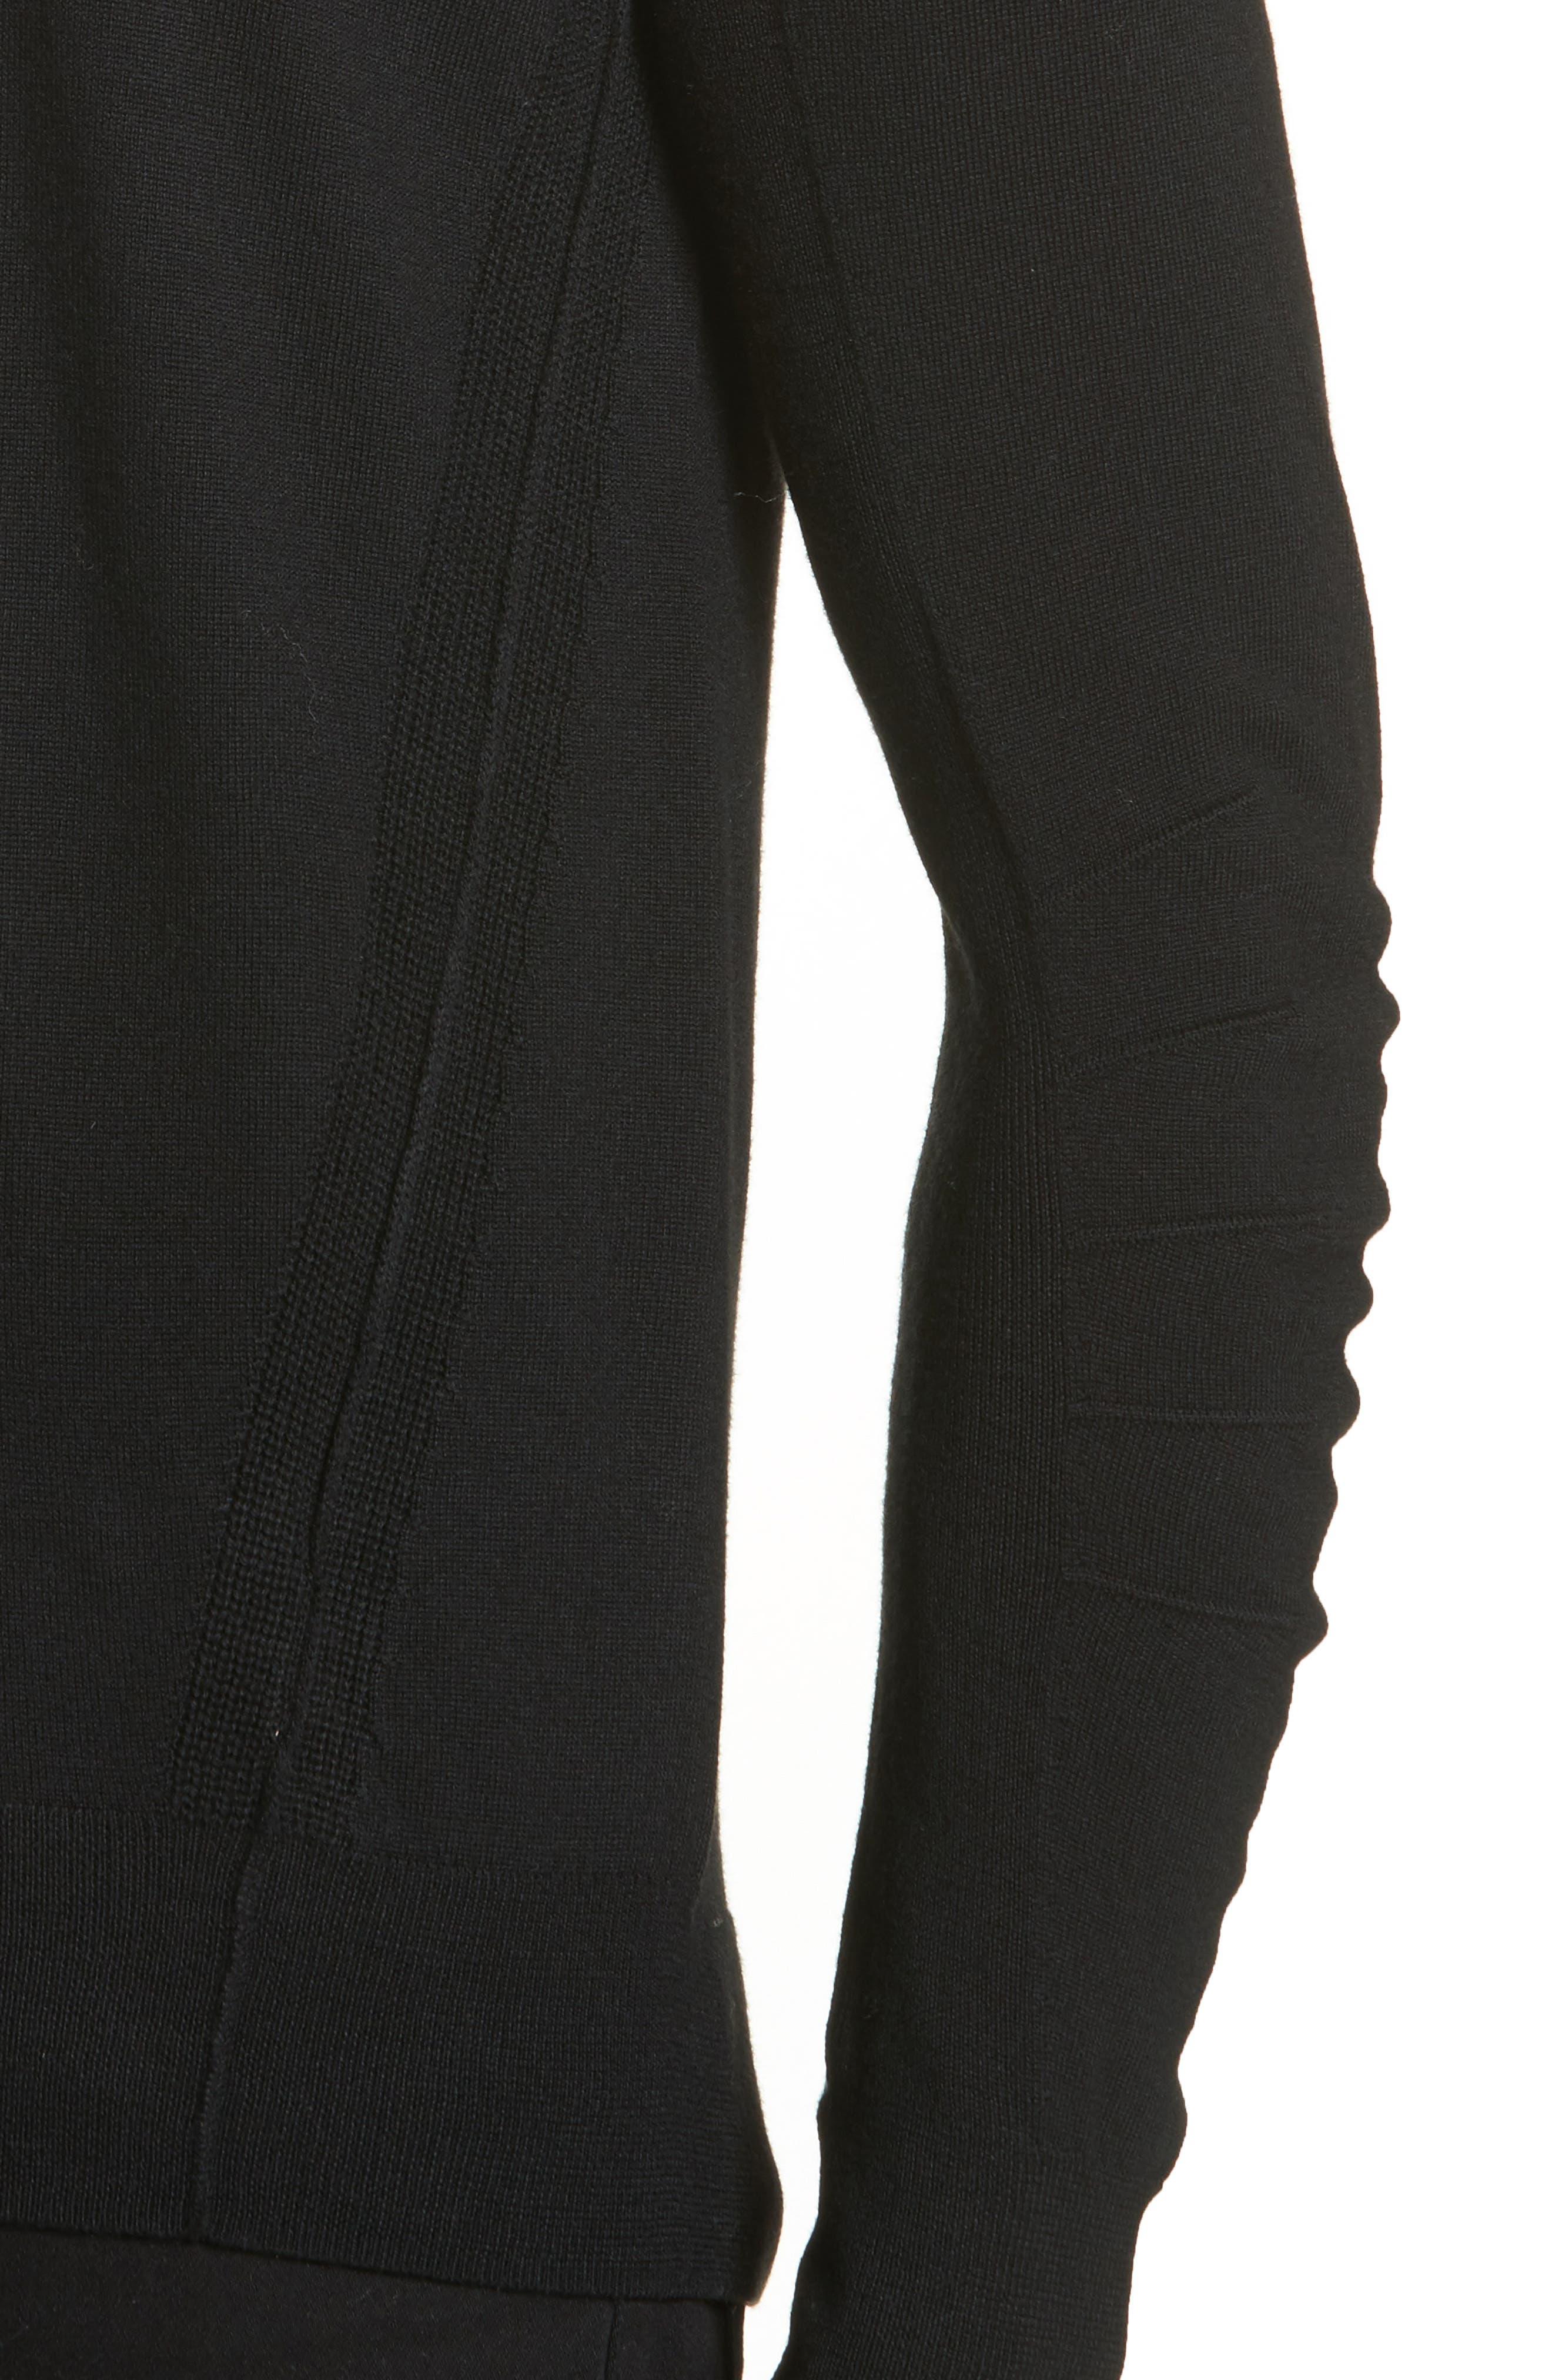 Carter Merino Wool Crewneck Sweater,                             Alternate thumbnail 4, color,                             BLACK